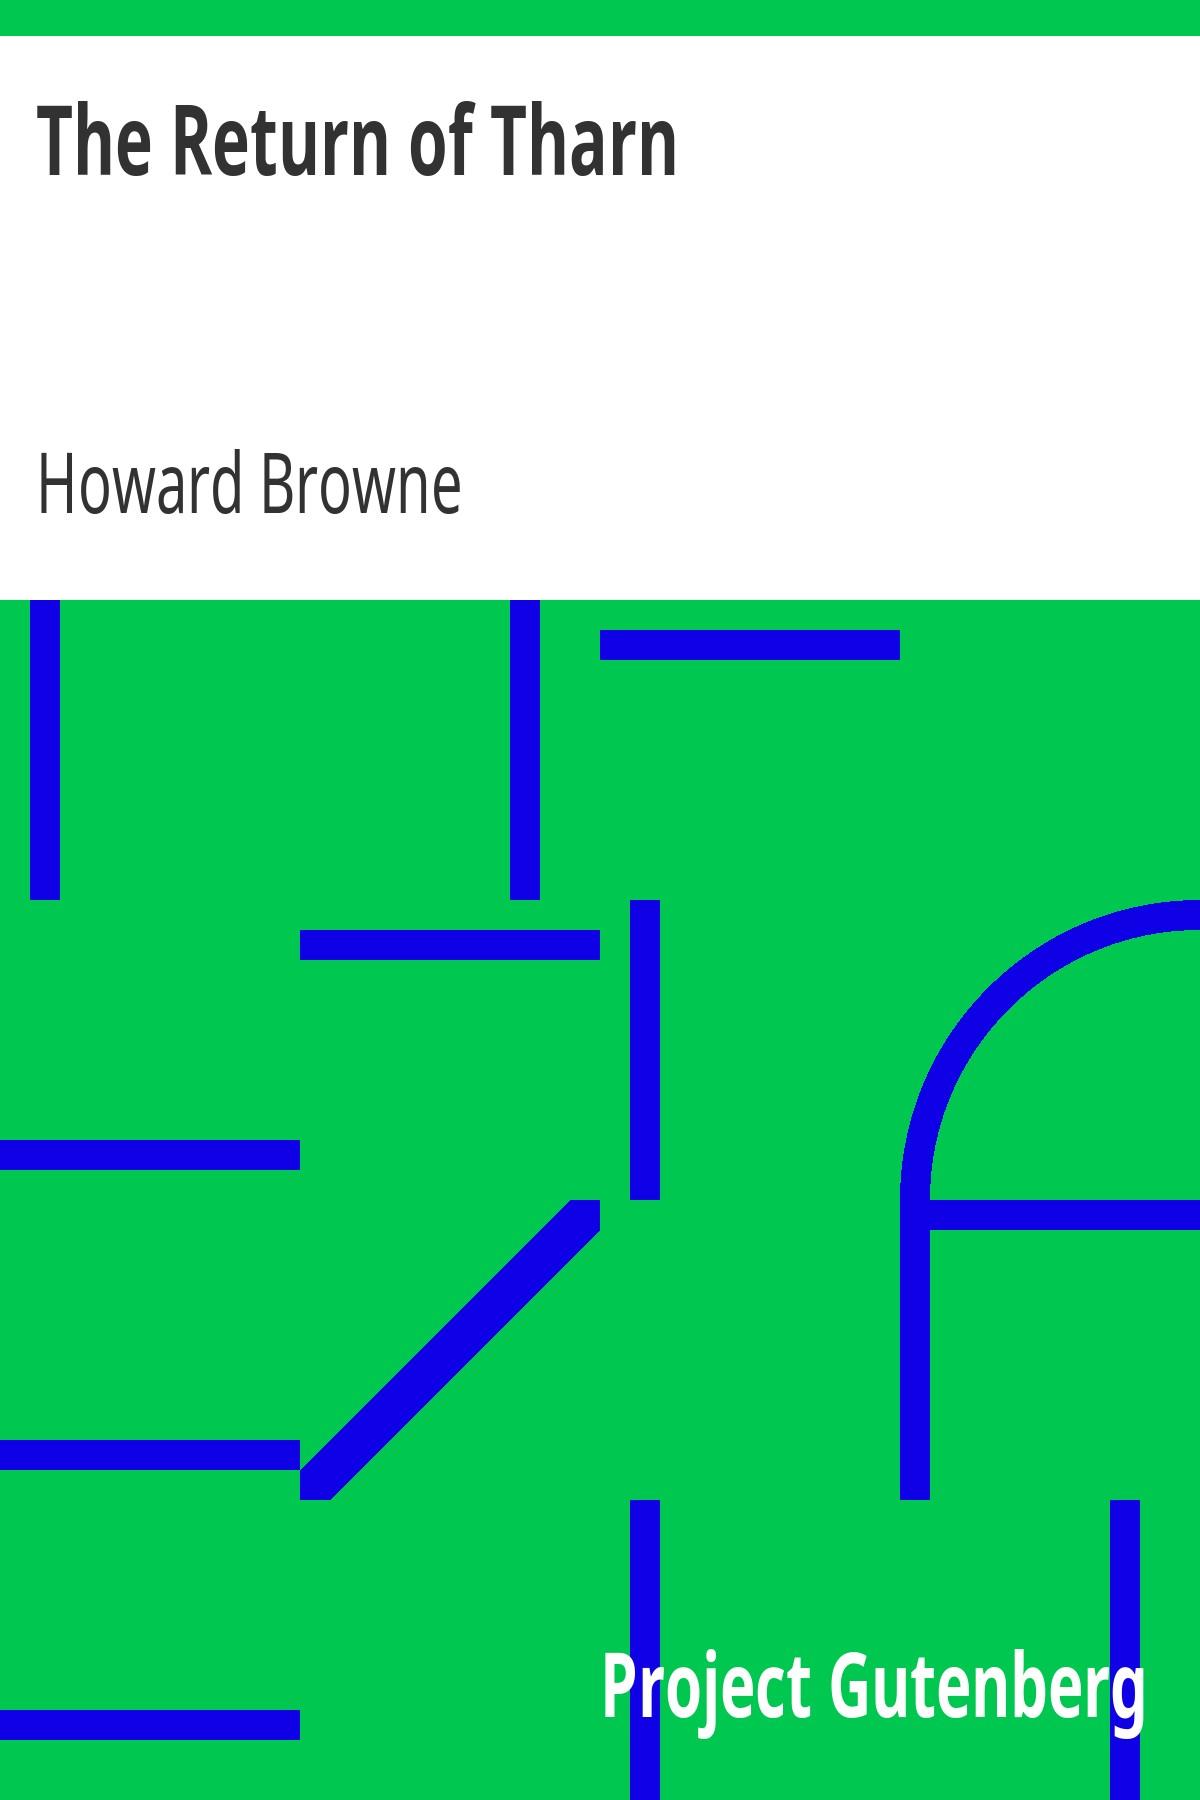 Howard Browne The Return of Tharn